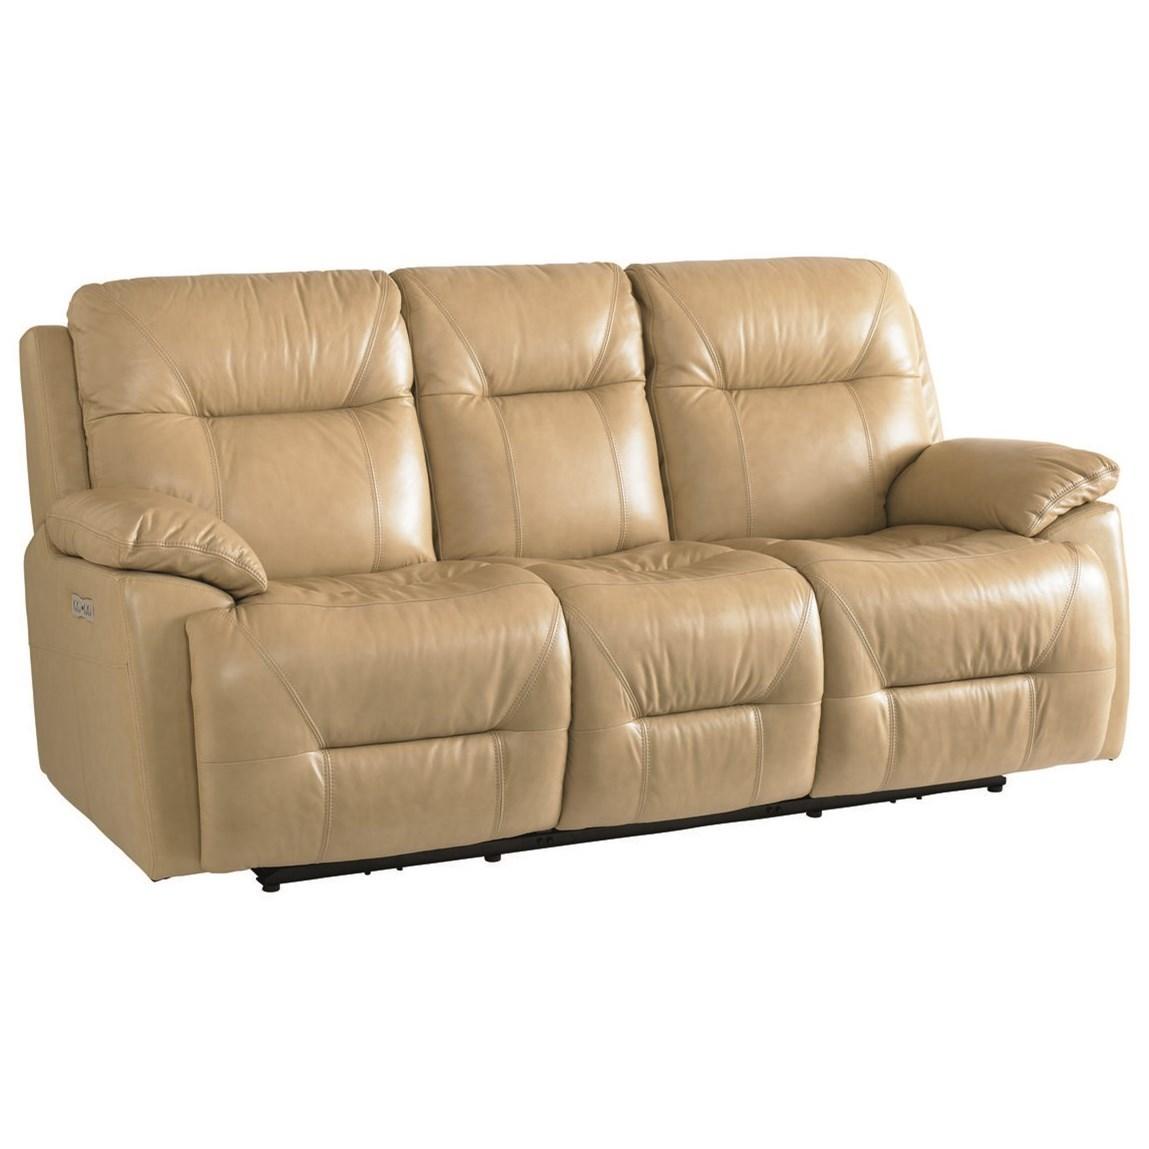 Bassett Leather Power Recline Sofa W Power Headrests